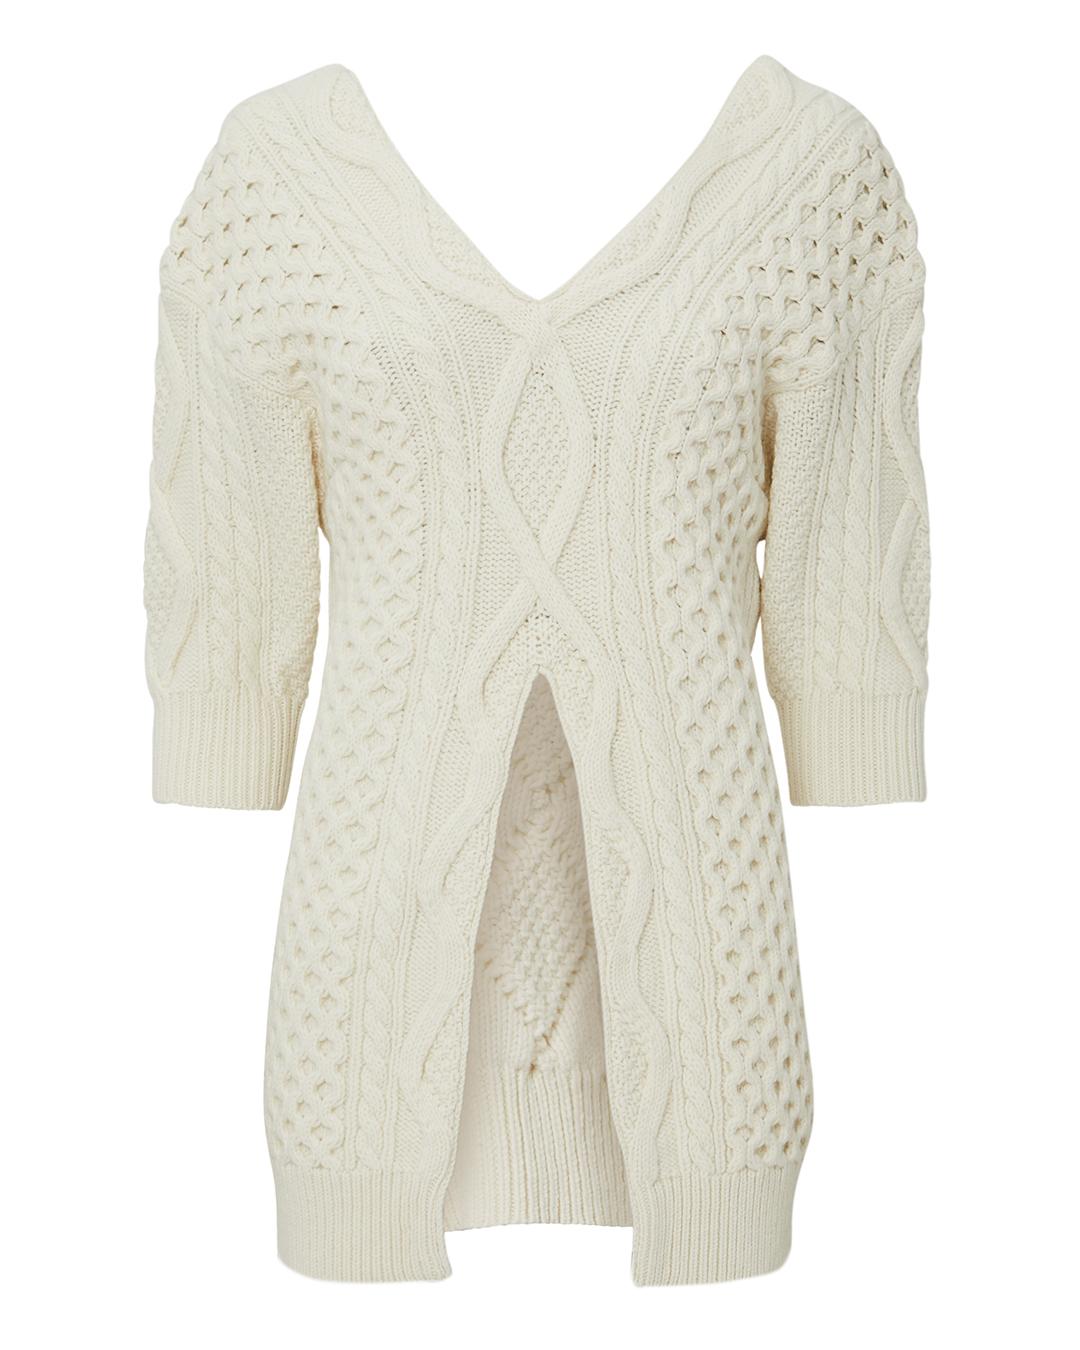 PHILLIP LIM 3.1 Hilli Lim Aran Cable Sweater Ivory